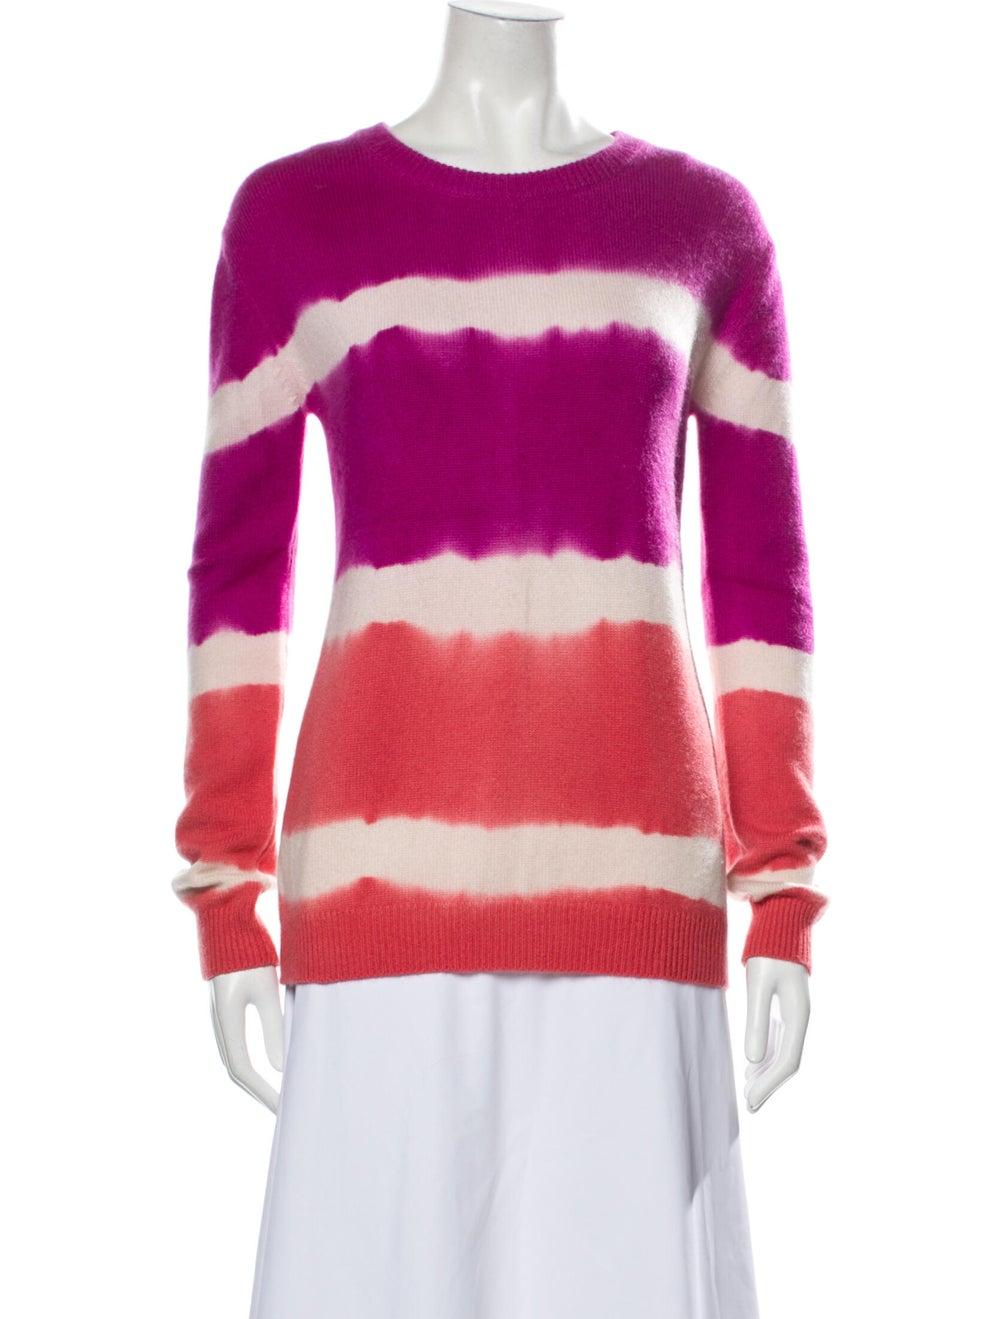 Prabal Gurung Cashmere Tie-Dye Print Sweater Purp… - image 1